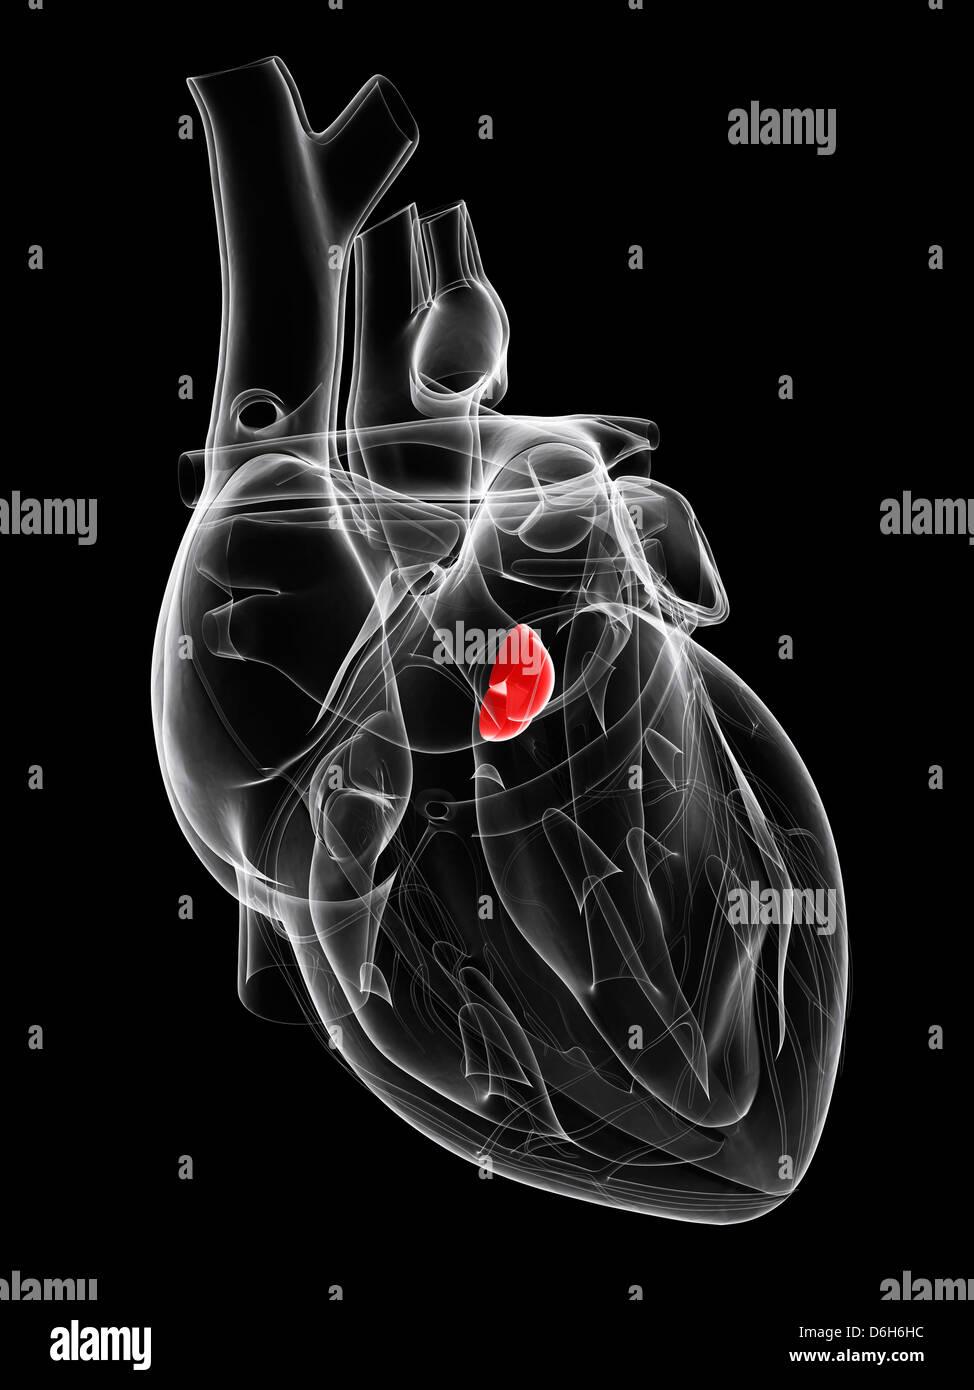 Aortic valve, artwork - Stock Image